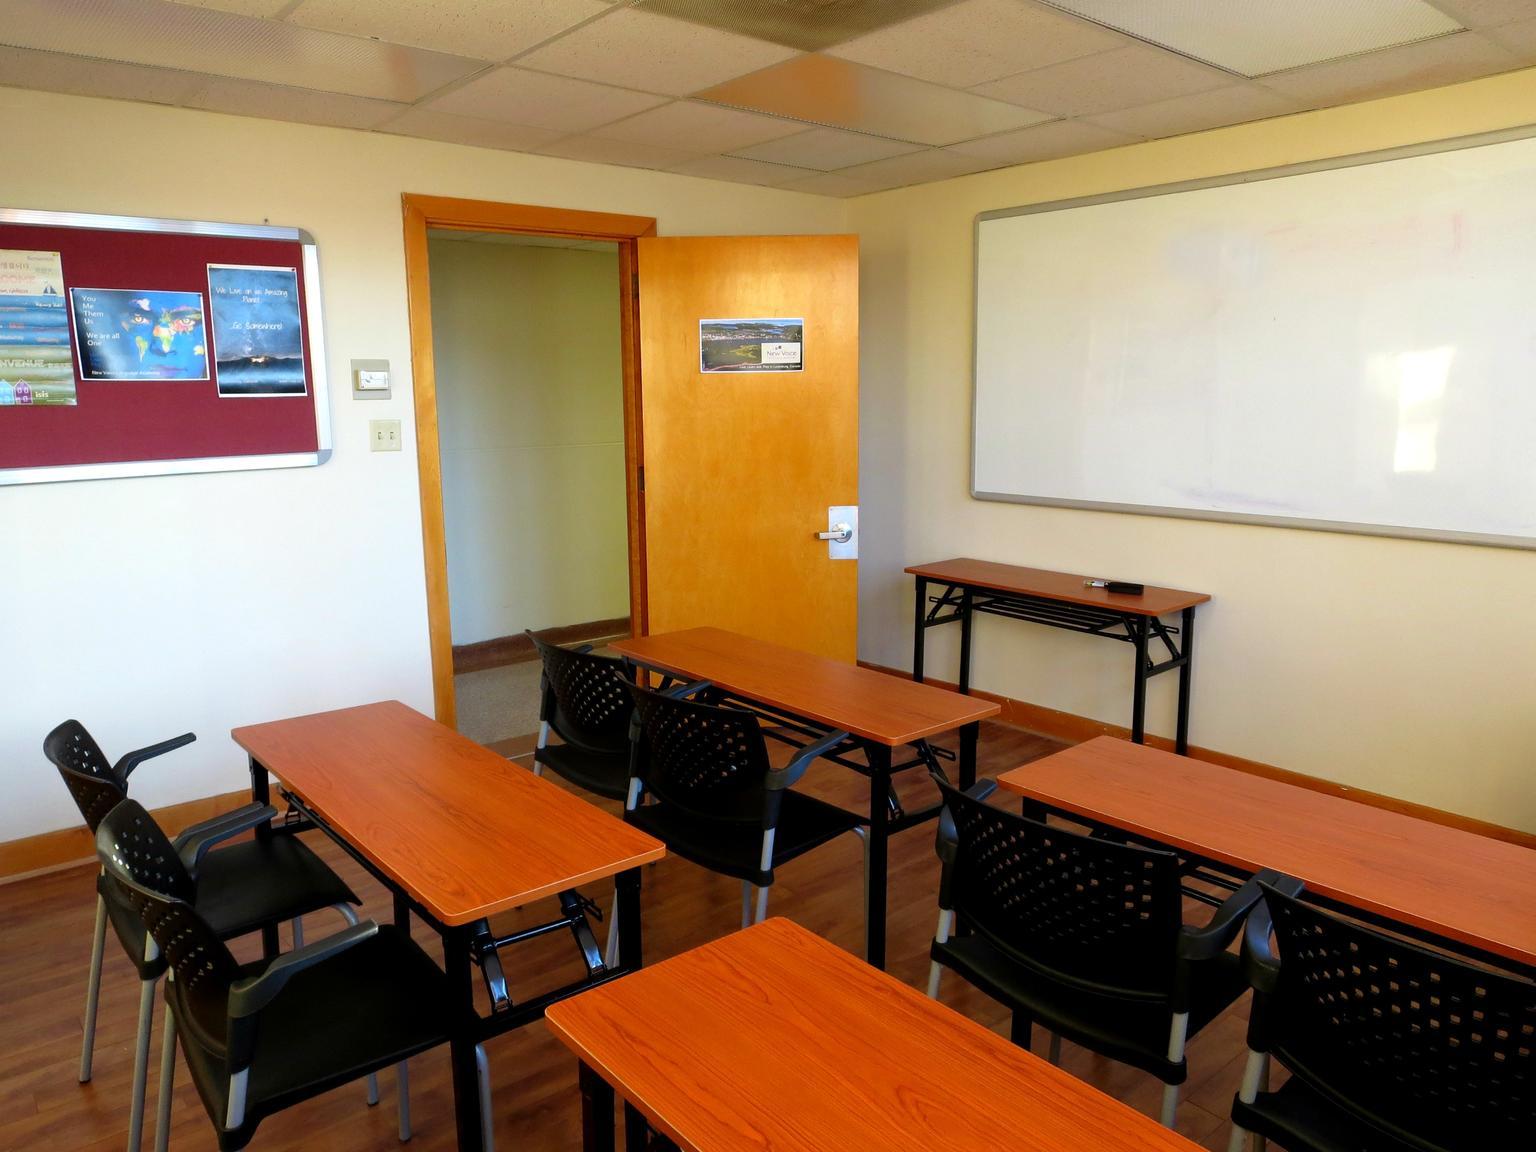 eurocentres_lunenburg_school_classroom